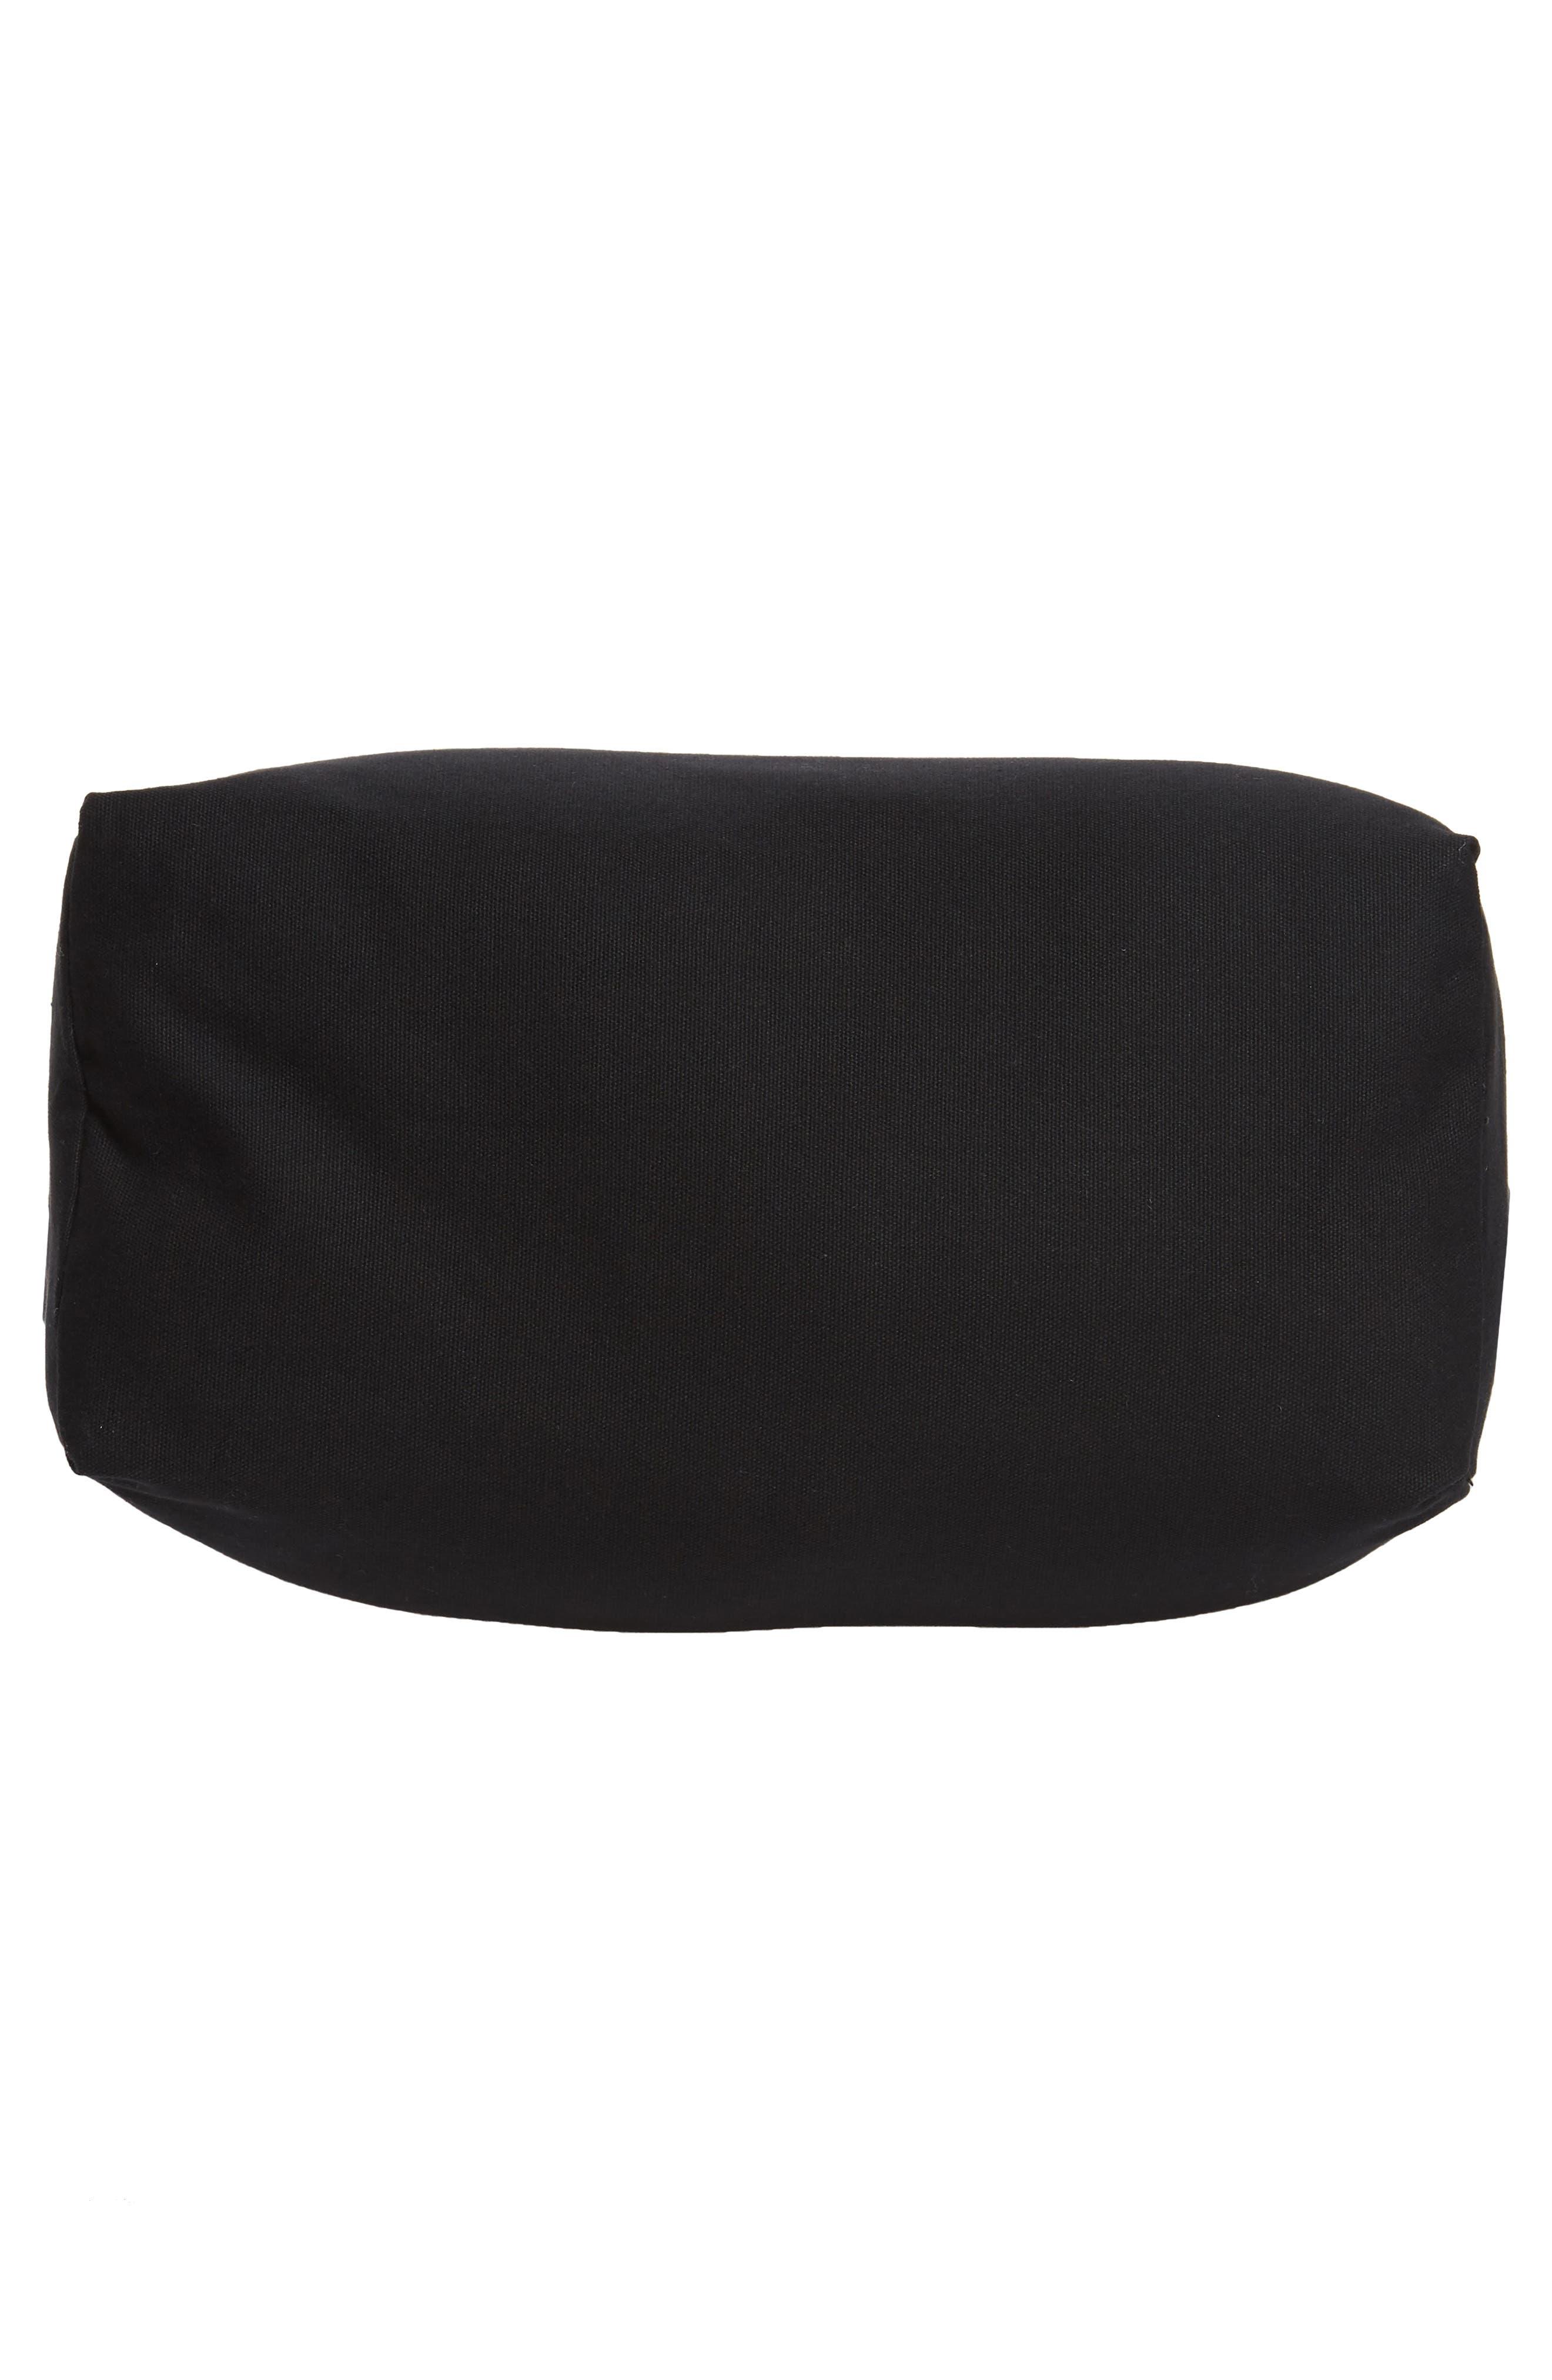 Established USA Tote Bag,                             Alternate thumbnail 6, color,                             001